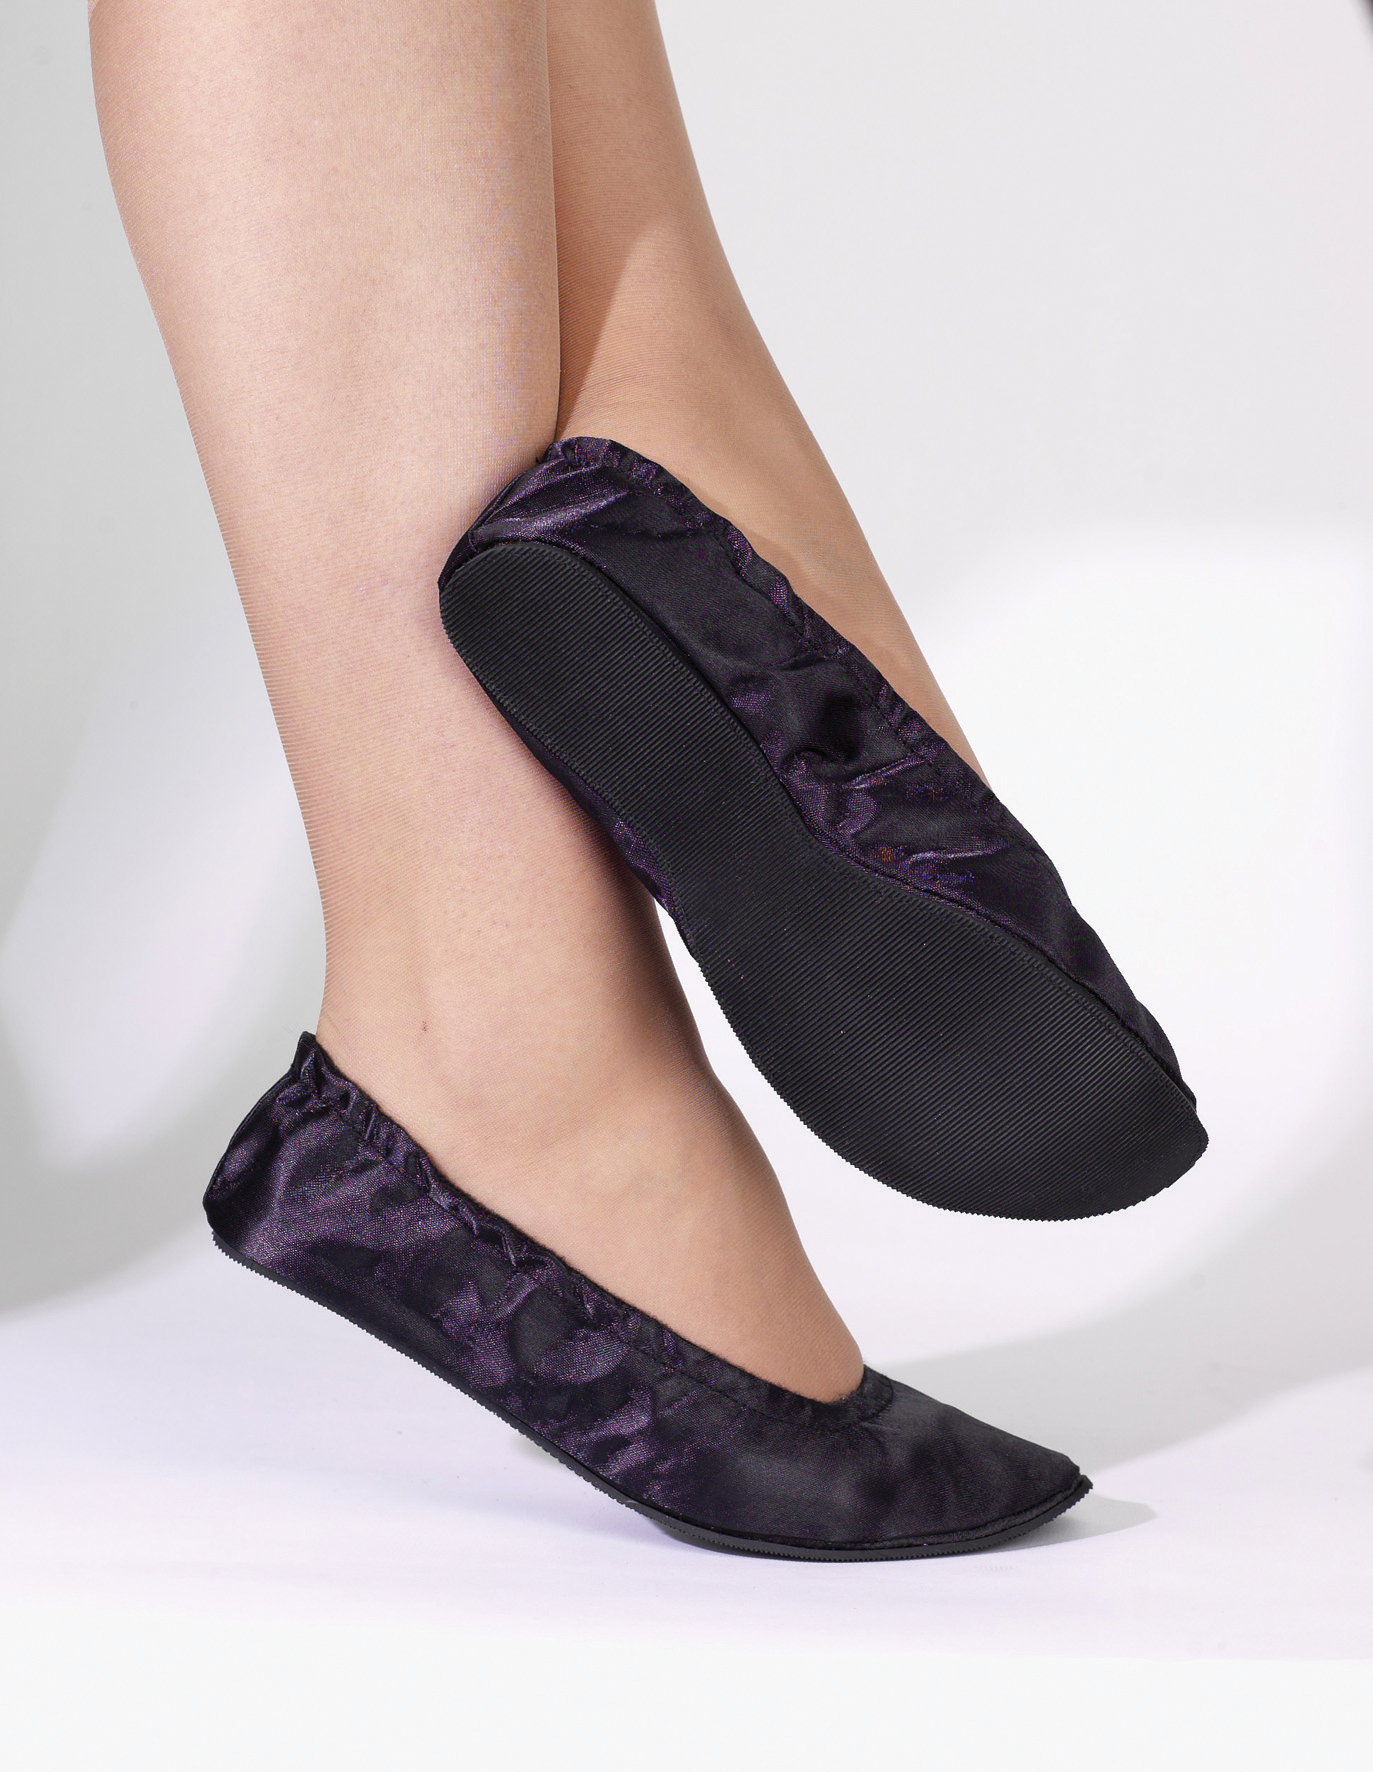 womens ballerina shoes satin flats pumps black s m l ebay